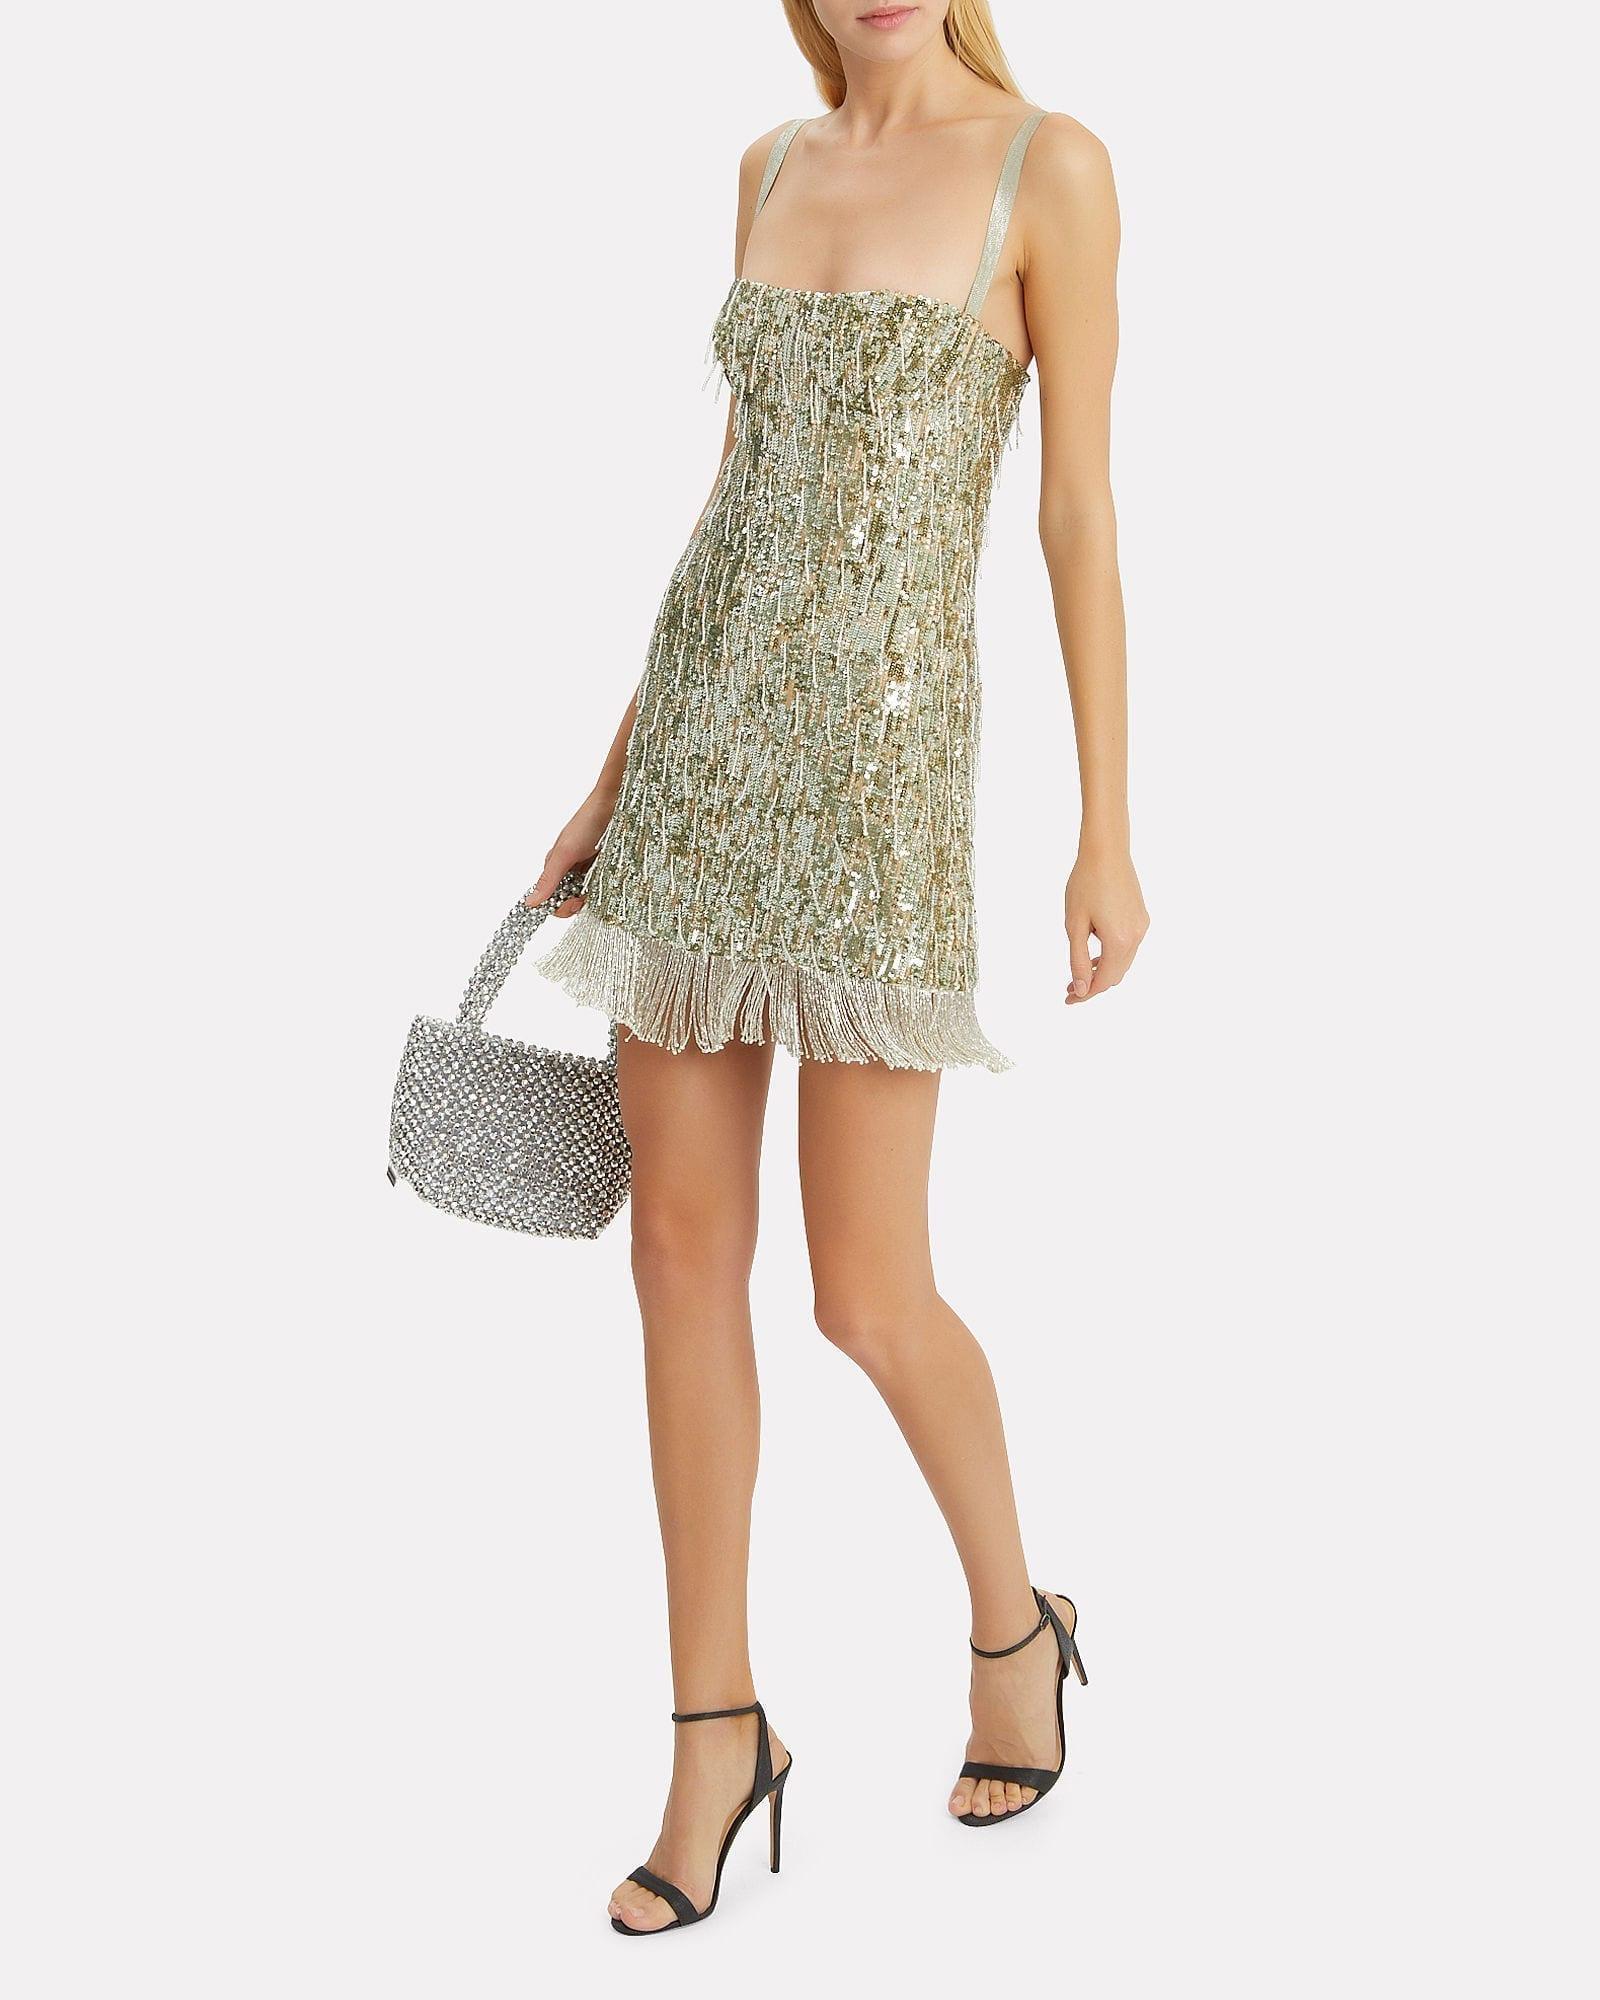 Alexis Silver alexis izabell sequin mini silver dress - we select dresses